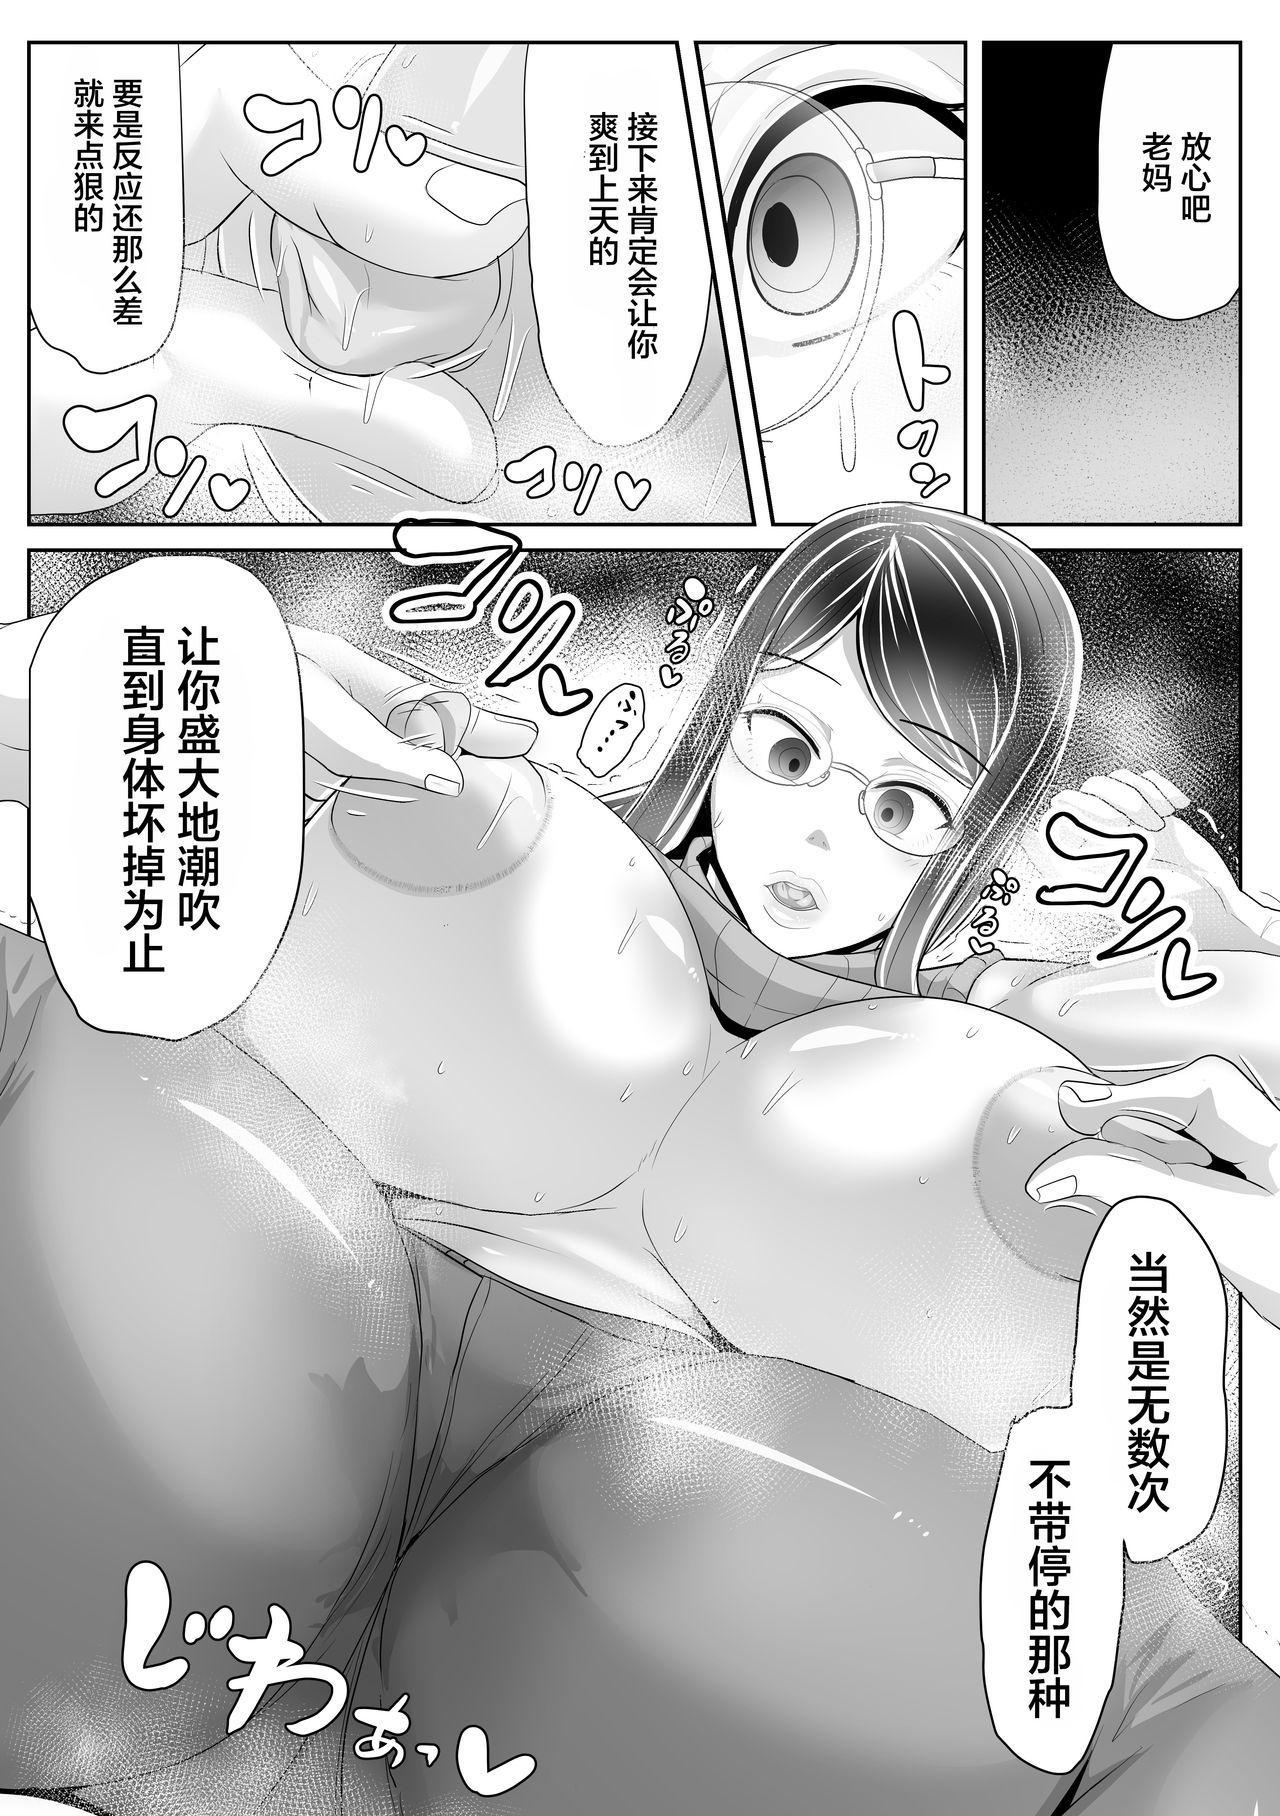 [Akikan] Kaa-san Senyou Saimin Appli[Chinese]【不可视汉化】 13